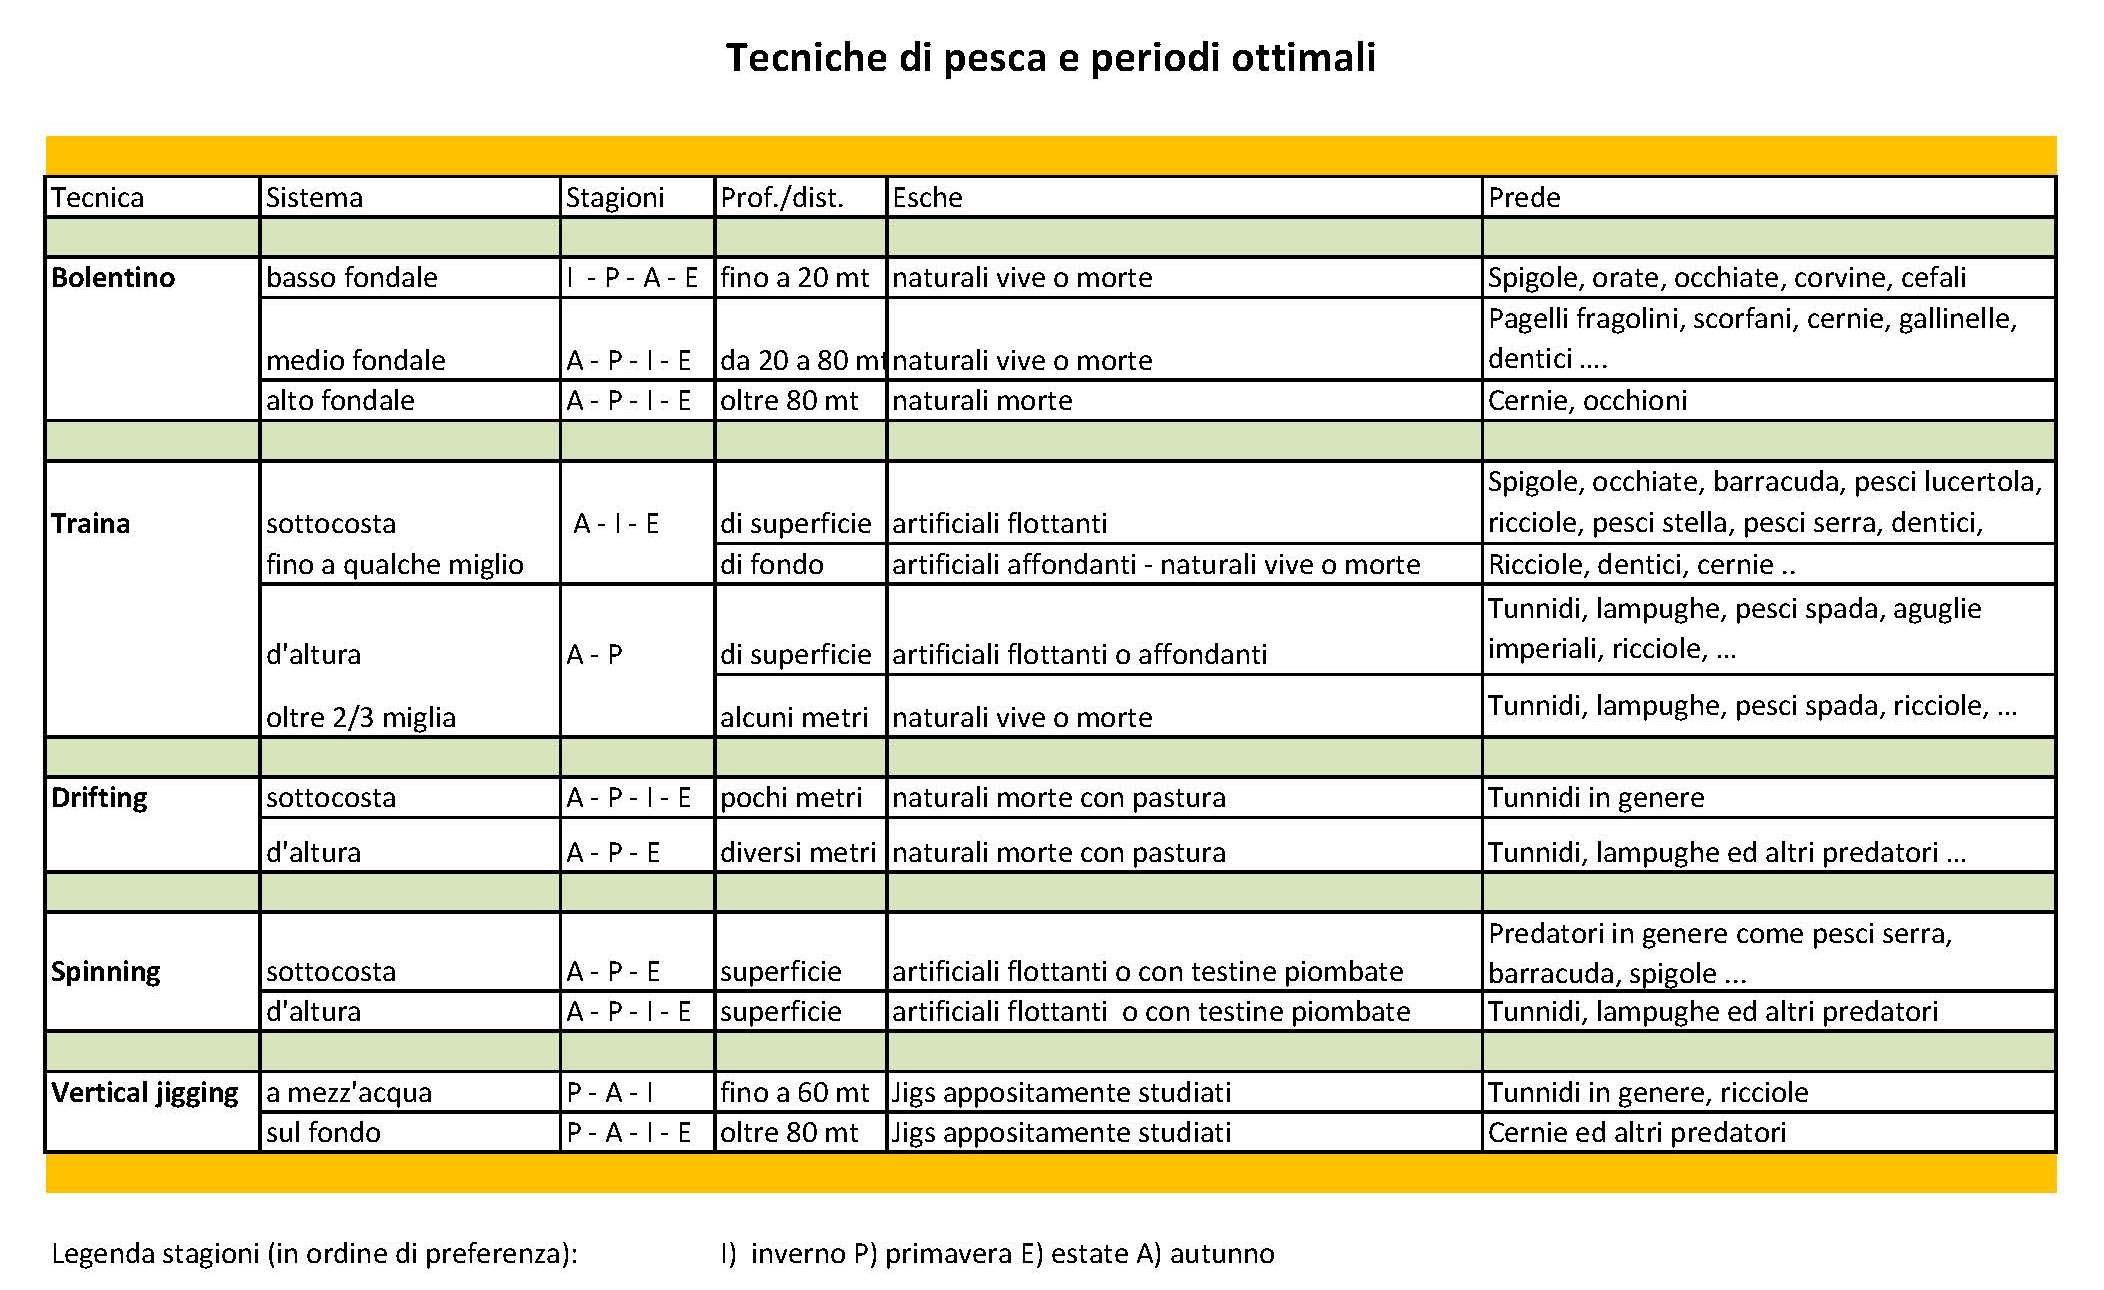 Scheda tecniche pesca sportiva-Ischia-periodi